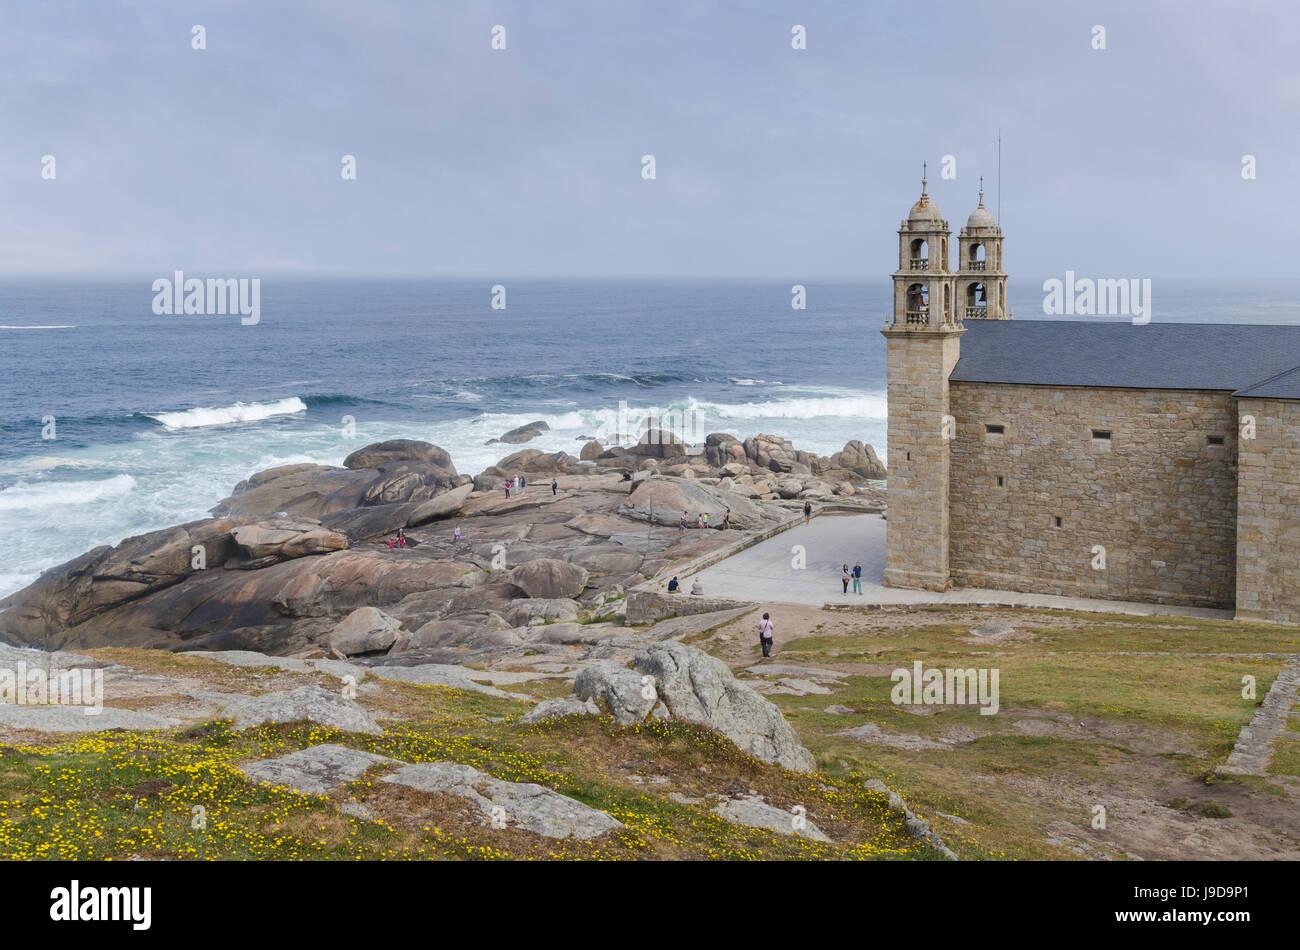 Nosa Senora da Barca (Our Lady of the Boat) Church in Muxia, A Coruna, Galicia, Spain, Europe - Stock Image